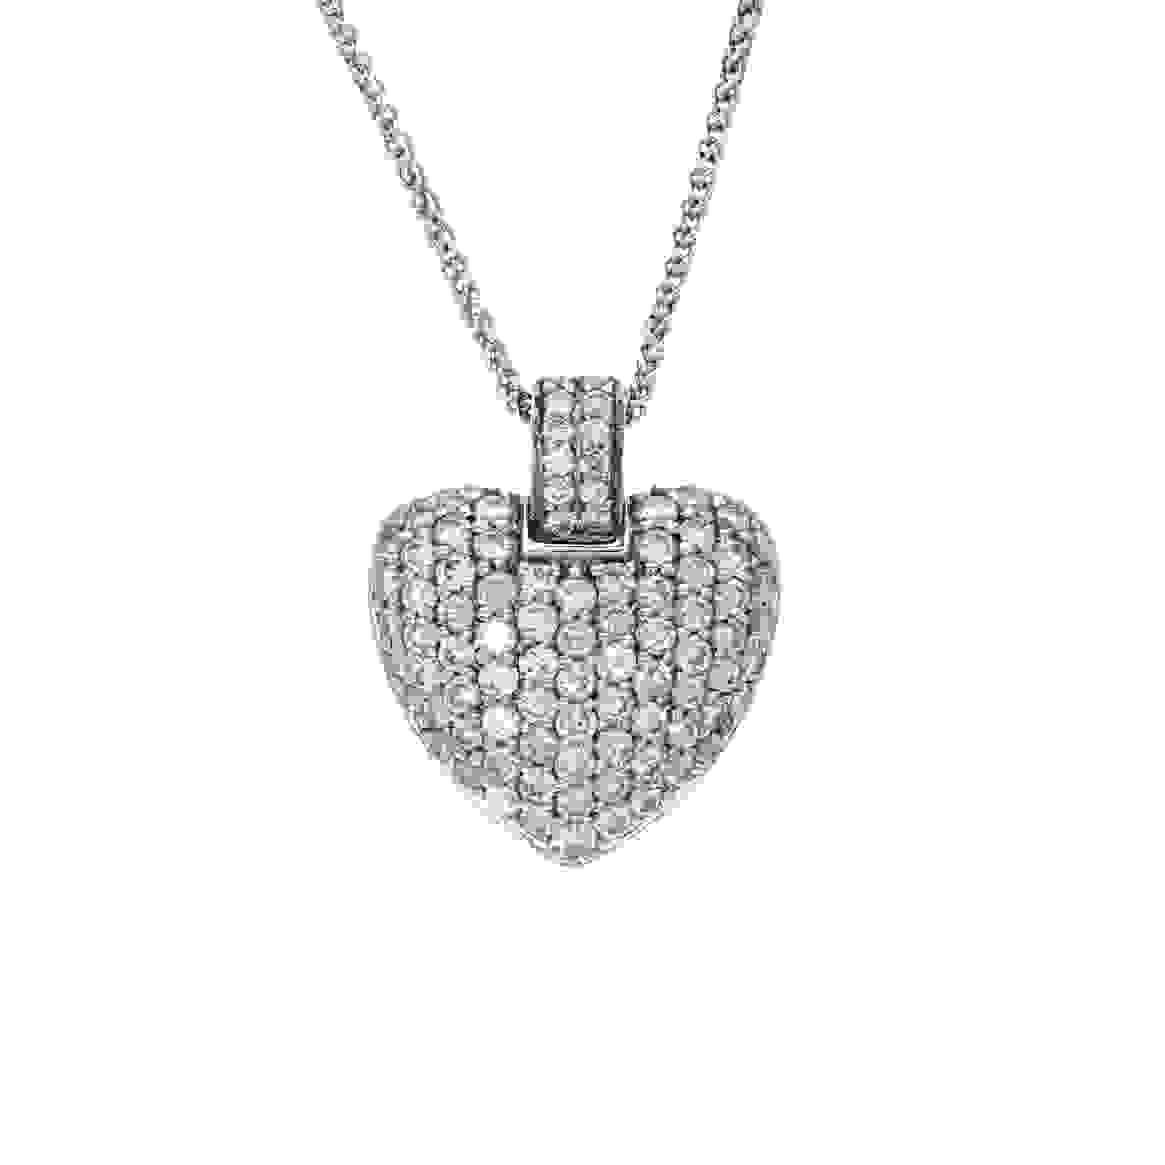 Wylde Offer (Bath Shop): 18ct white gold, multi-diamond pave heart pendant